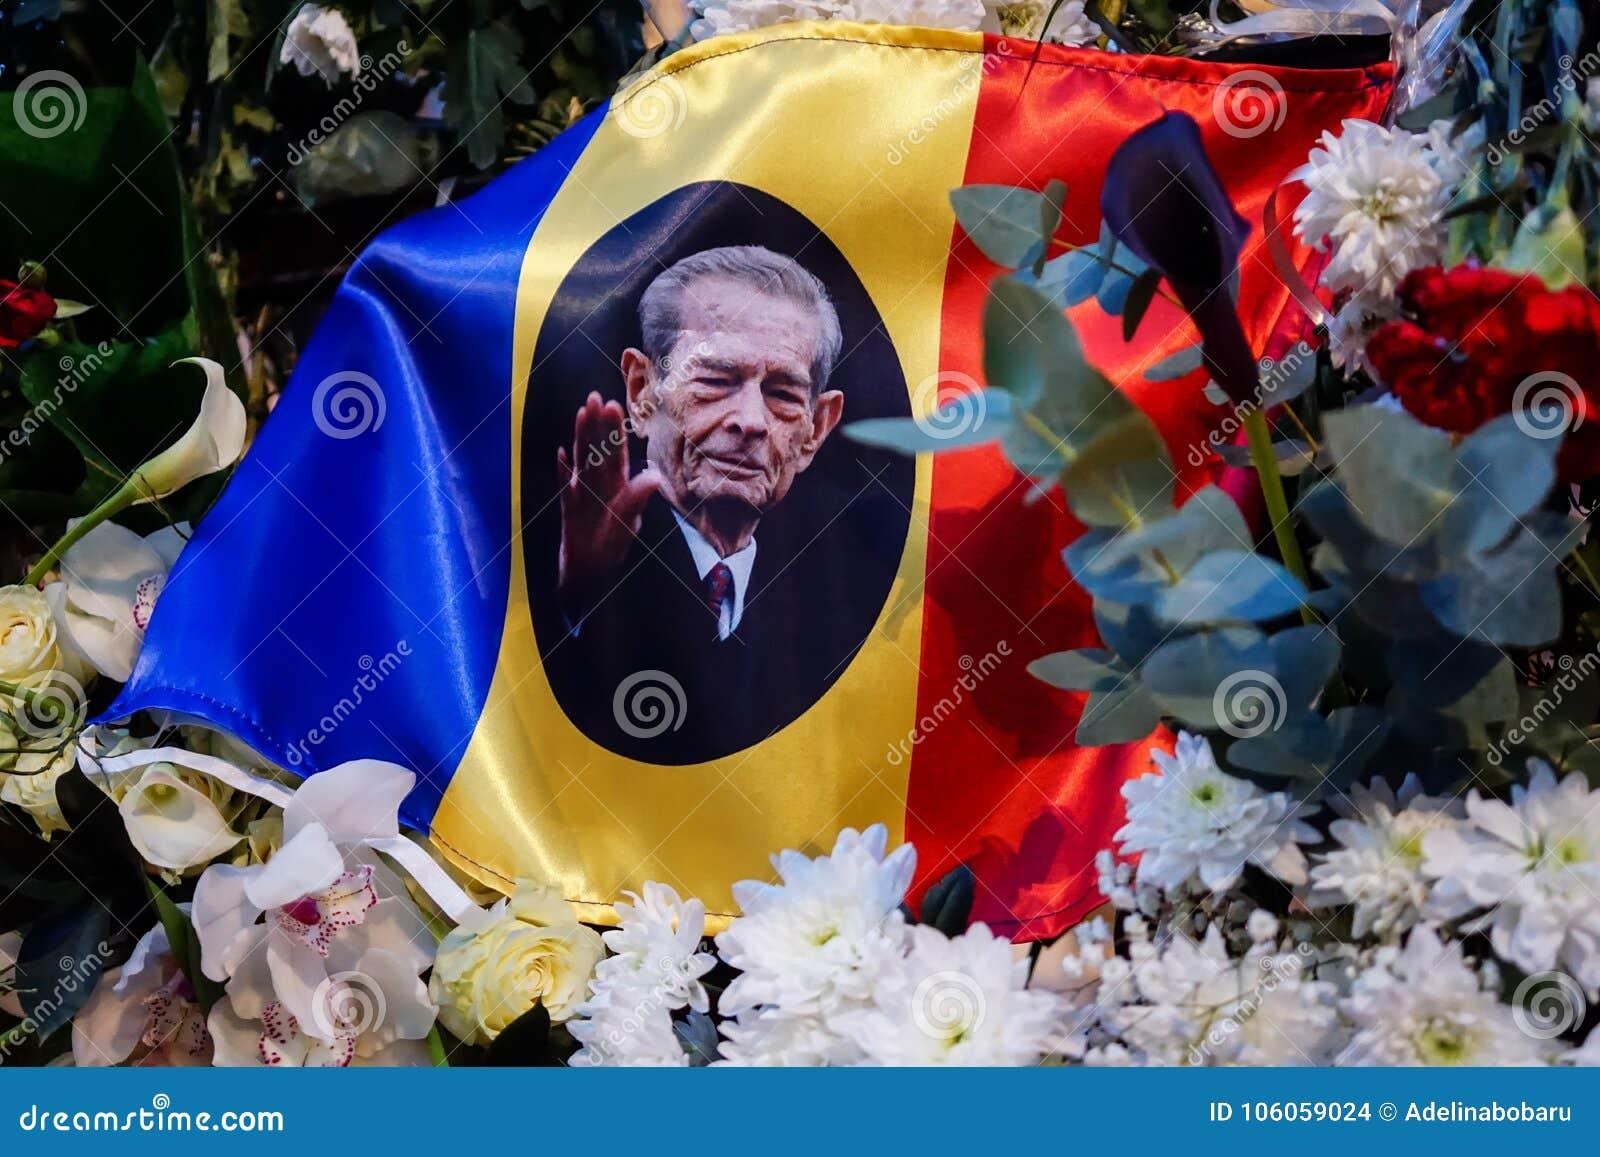 Comemoration de la mort du Roi Mihai de la Roumanie